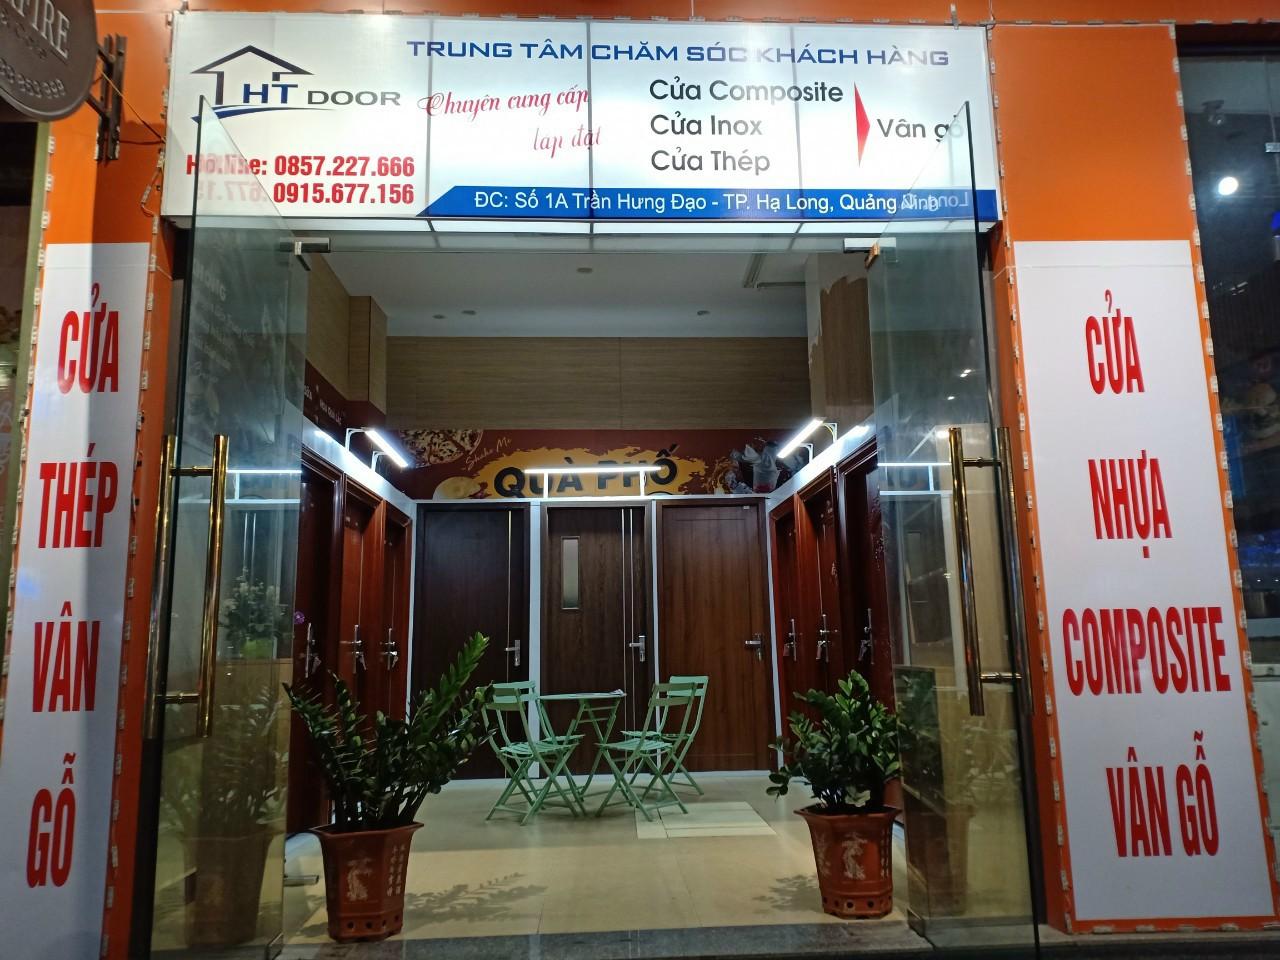 Showroom cửa composite Hạ Long